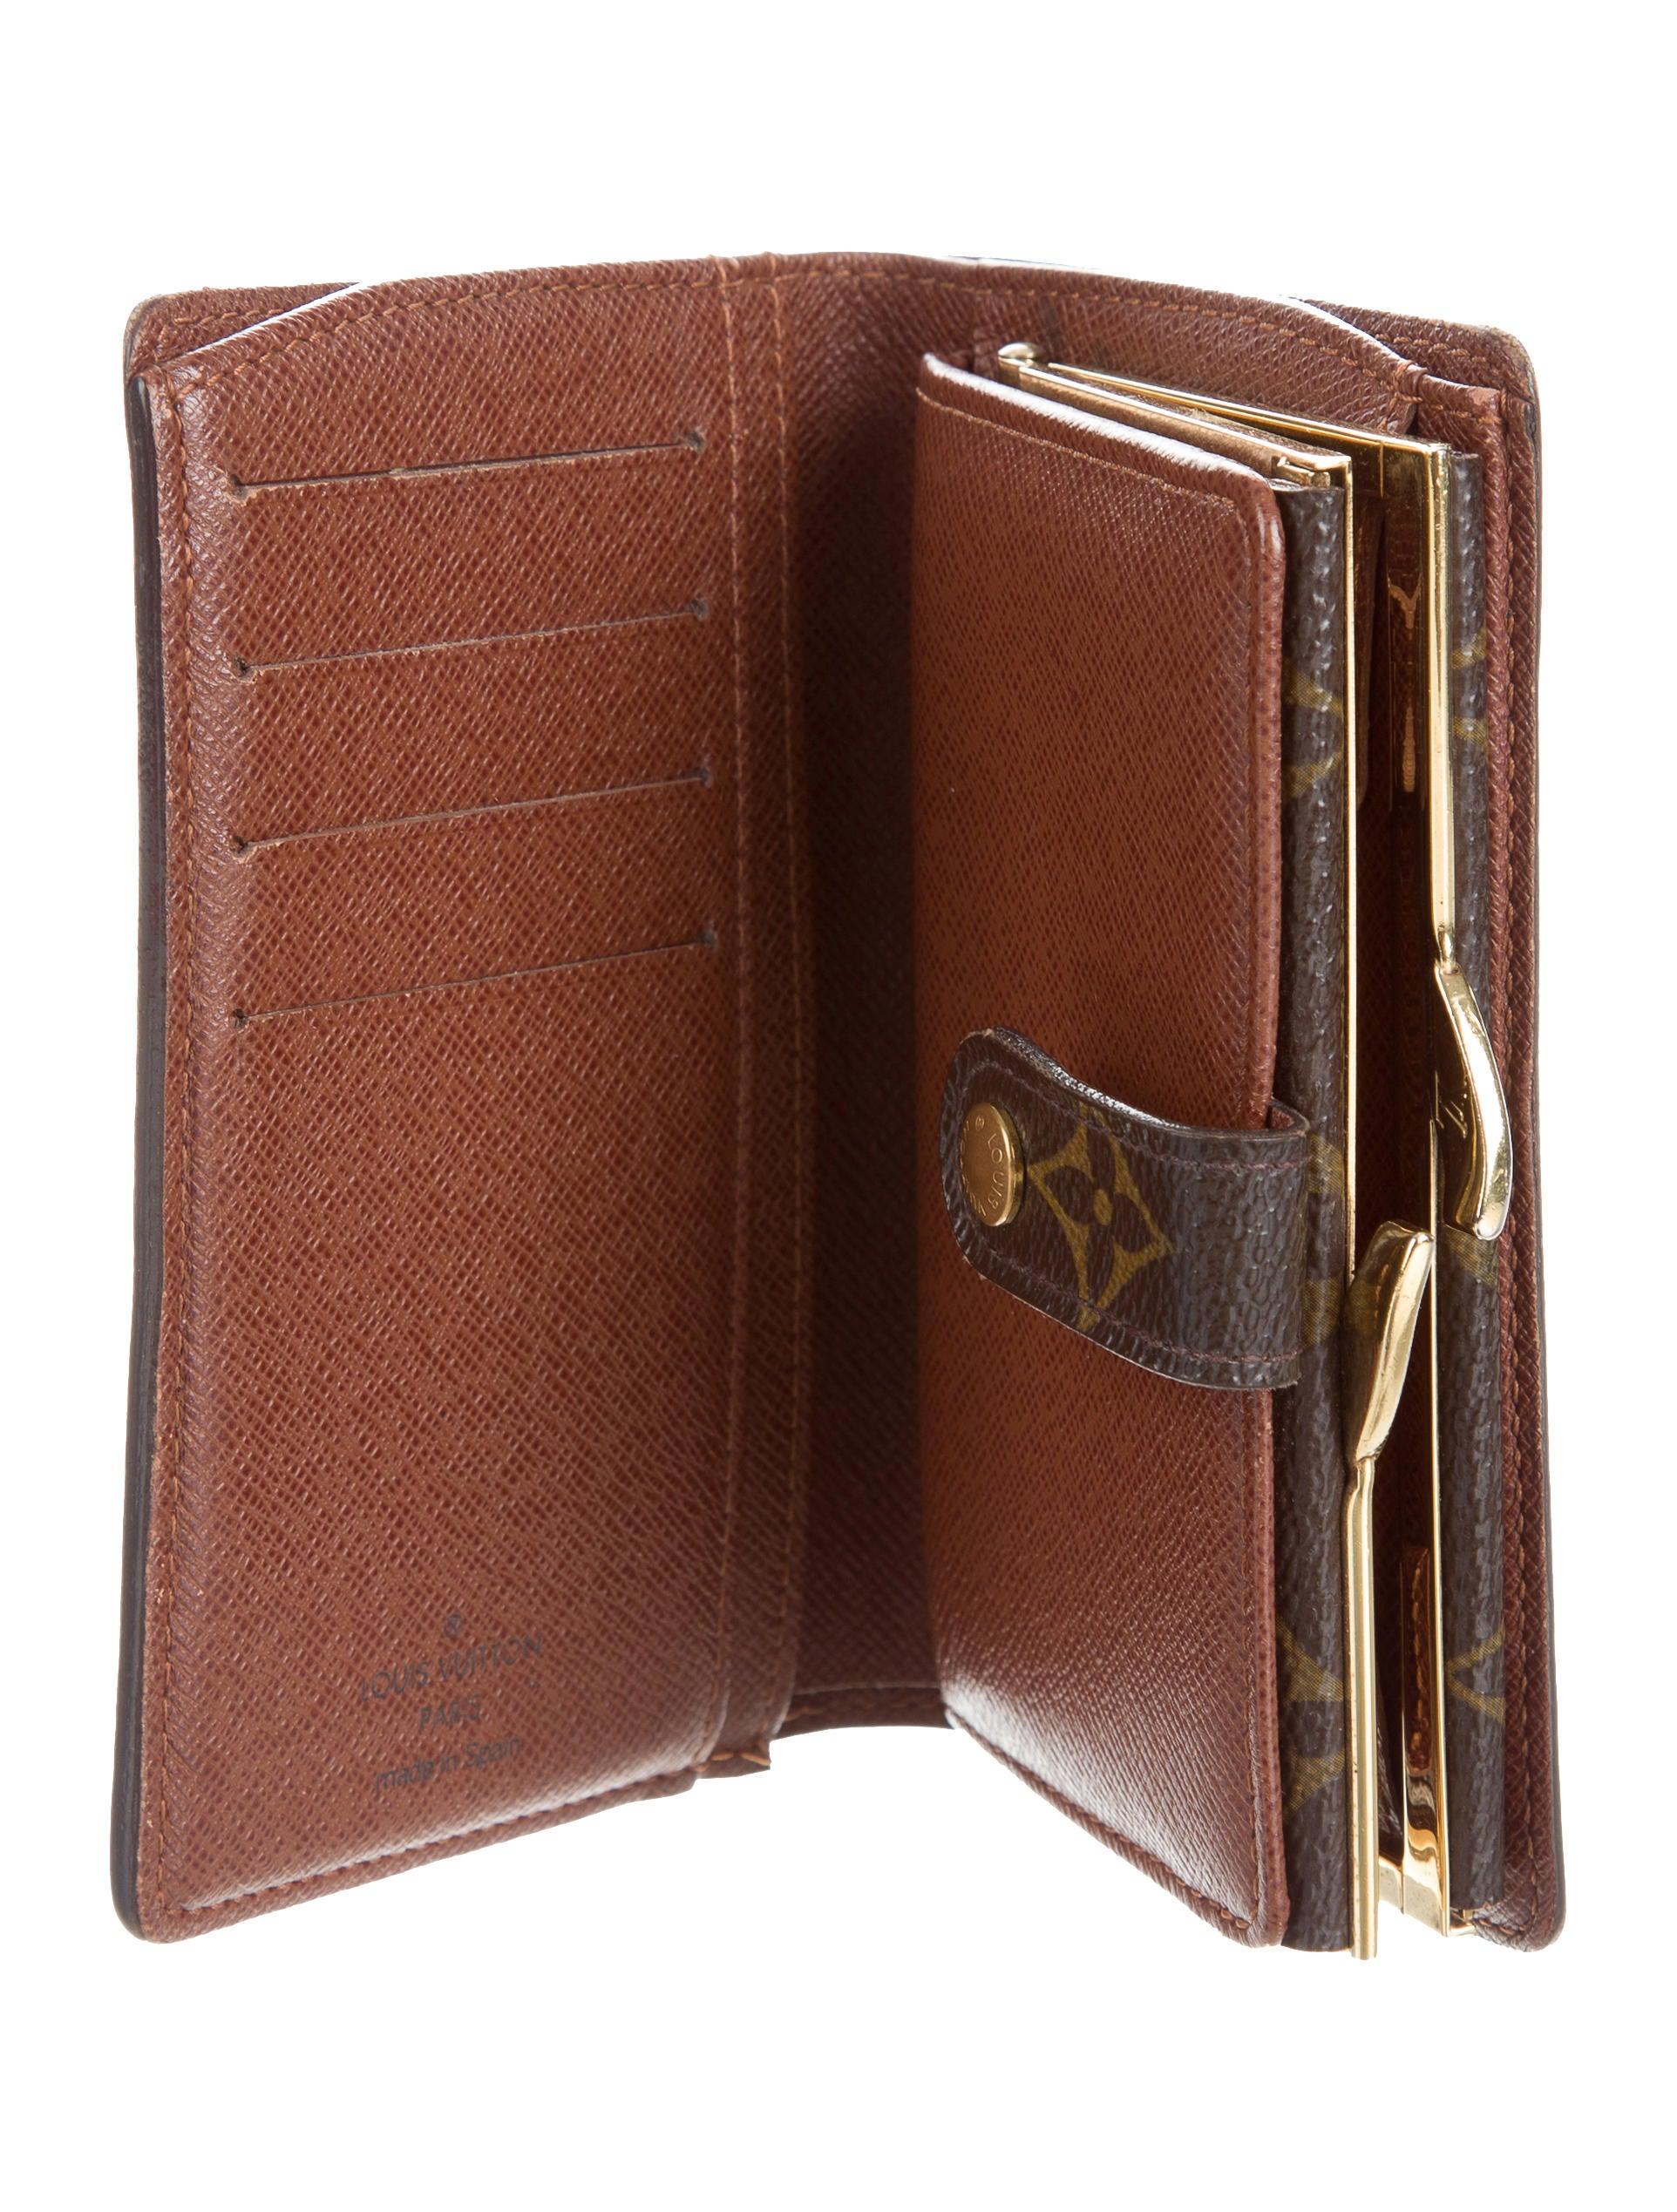 Louis Vuitton Monogram French Purse Wallet Accessories